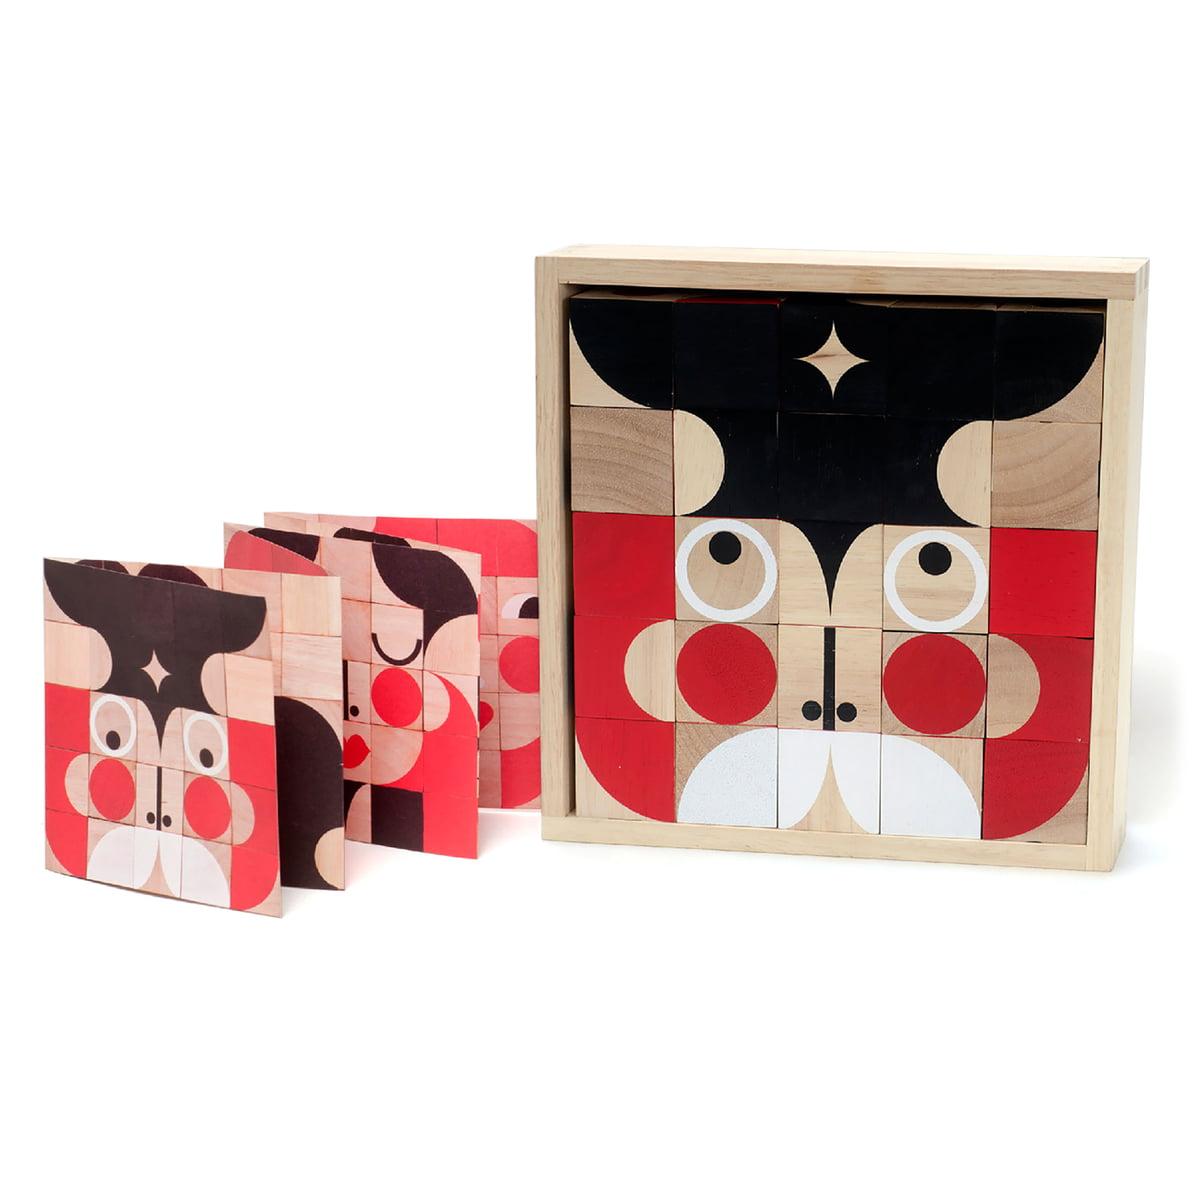 Miller Goodman - Deluxe FaceMaker Holzspielzeug   Kinderzimmer > Spielzeuge > Holzspielzeuge   Verschiedene farben   Holz   Miller Goodman